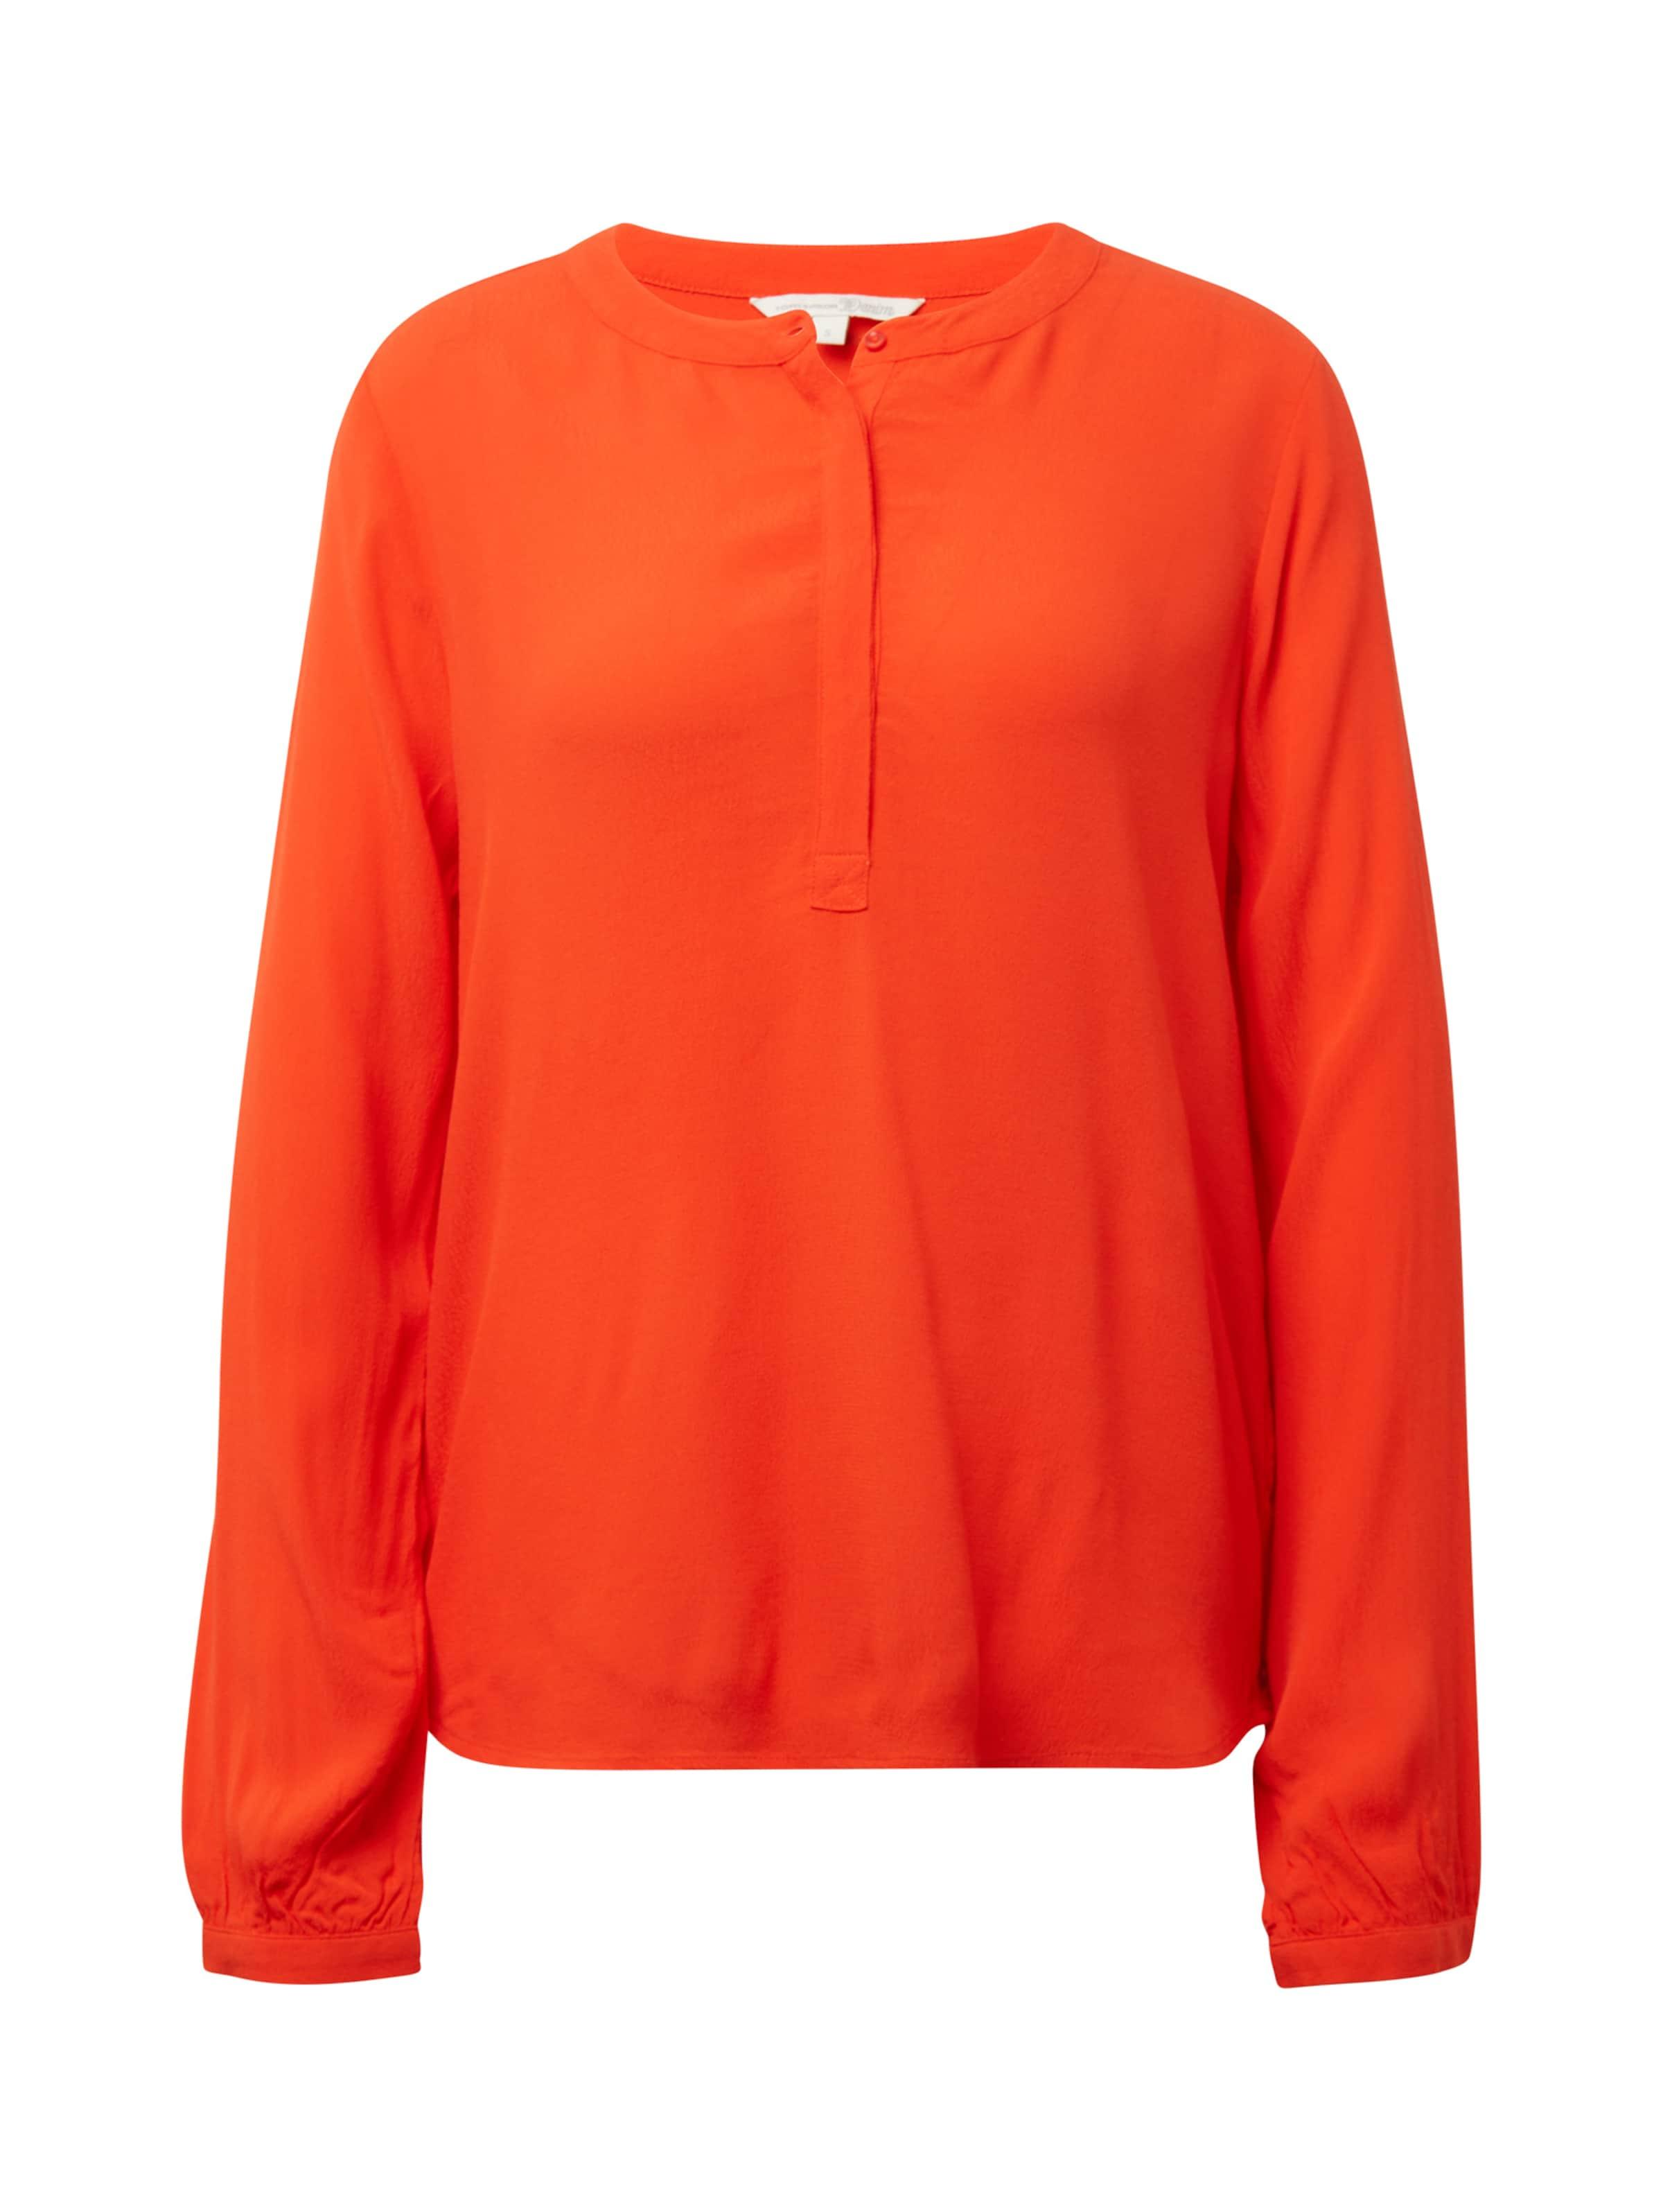 In Tunikabluse Tailor Orangerot Tom Denim EeDW2IbHY9